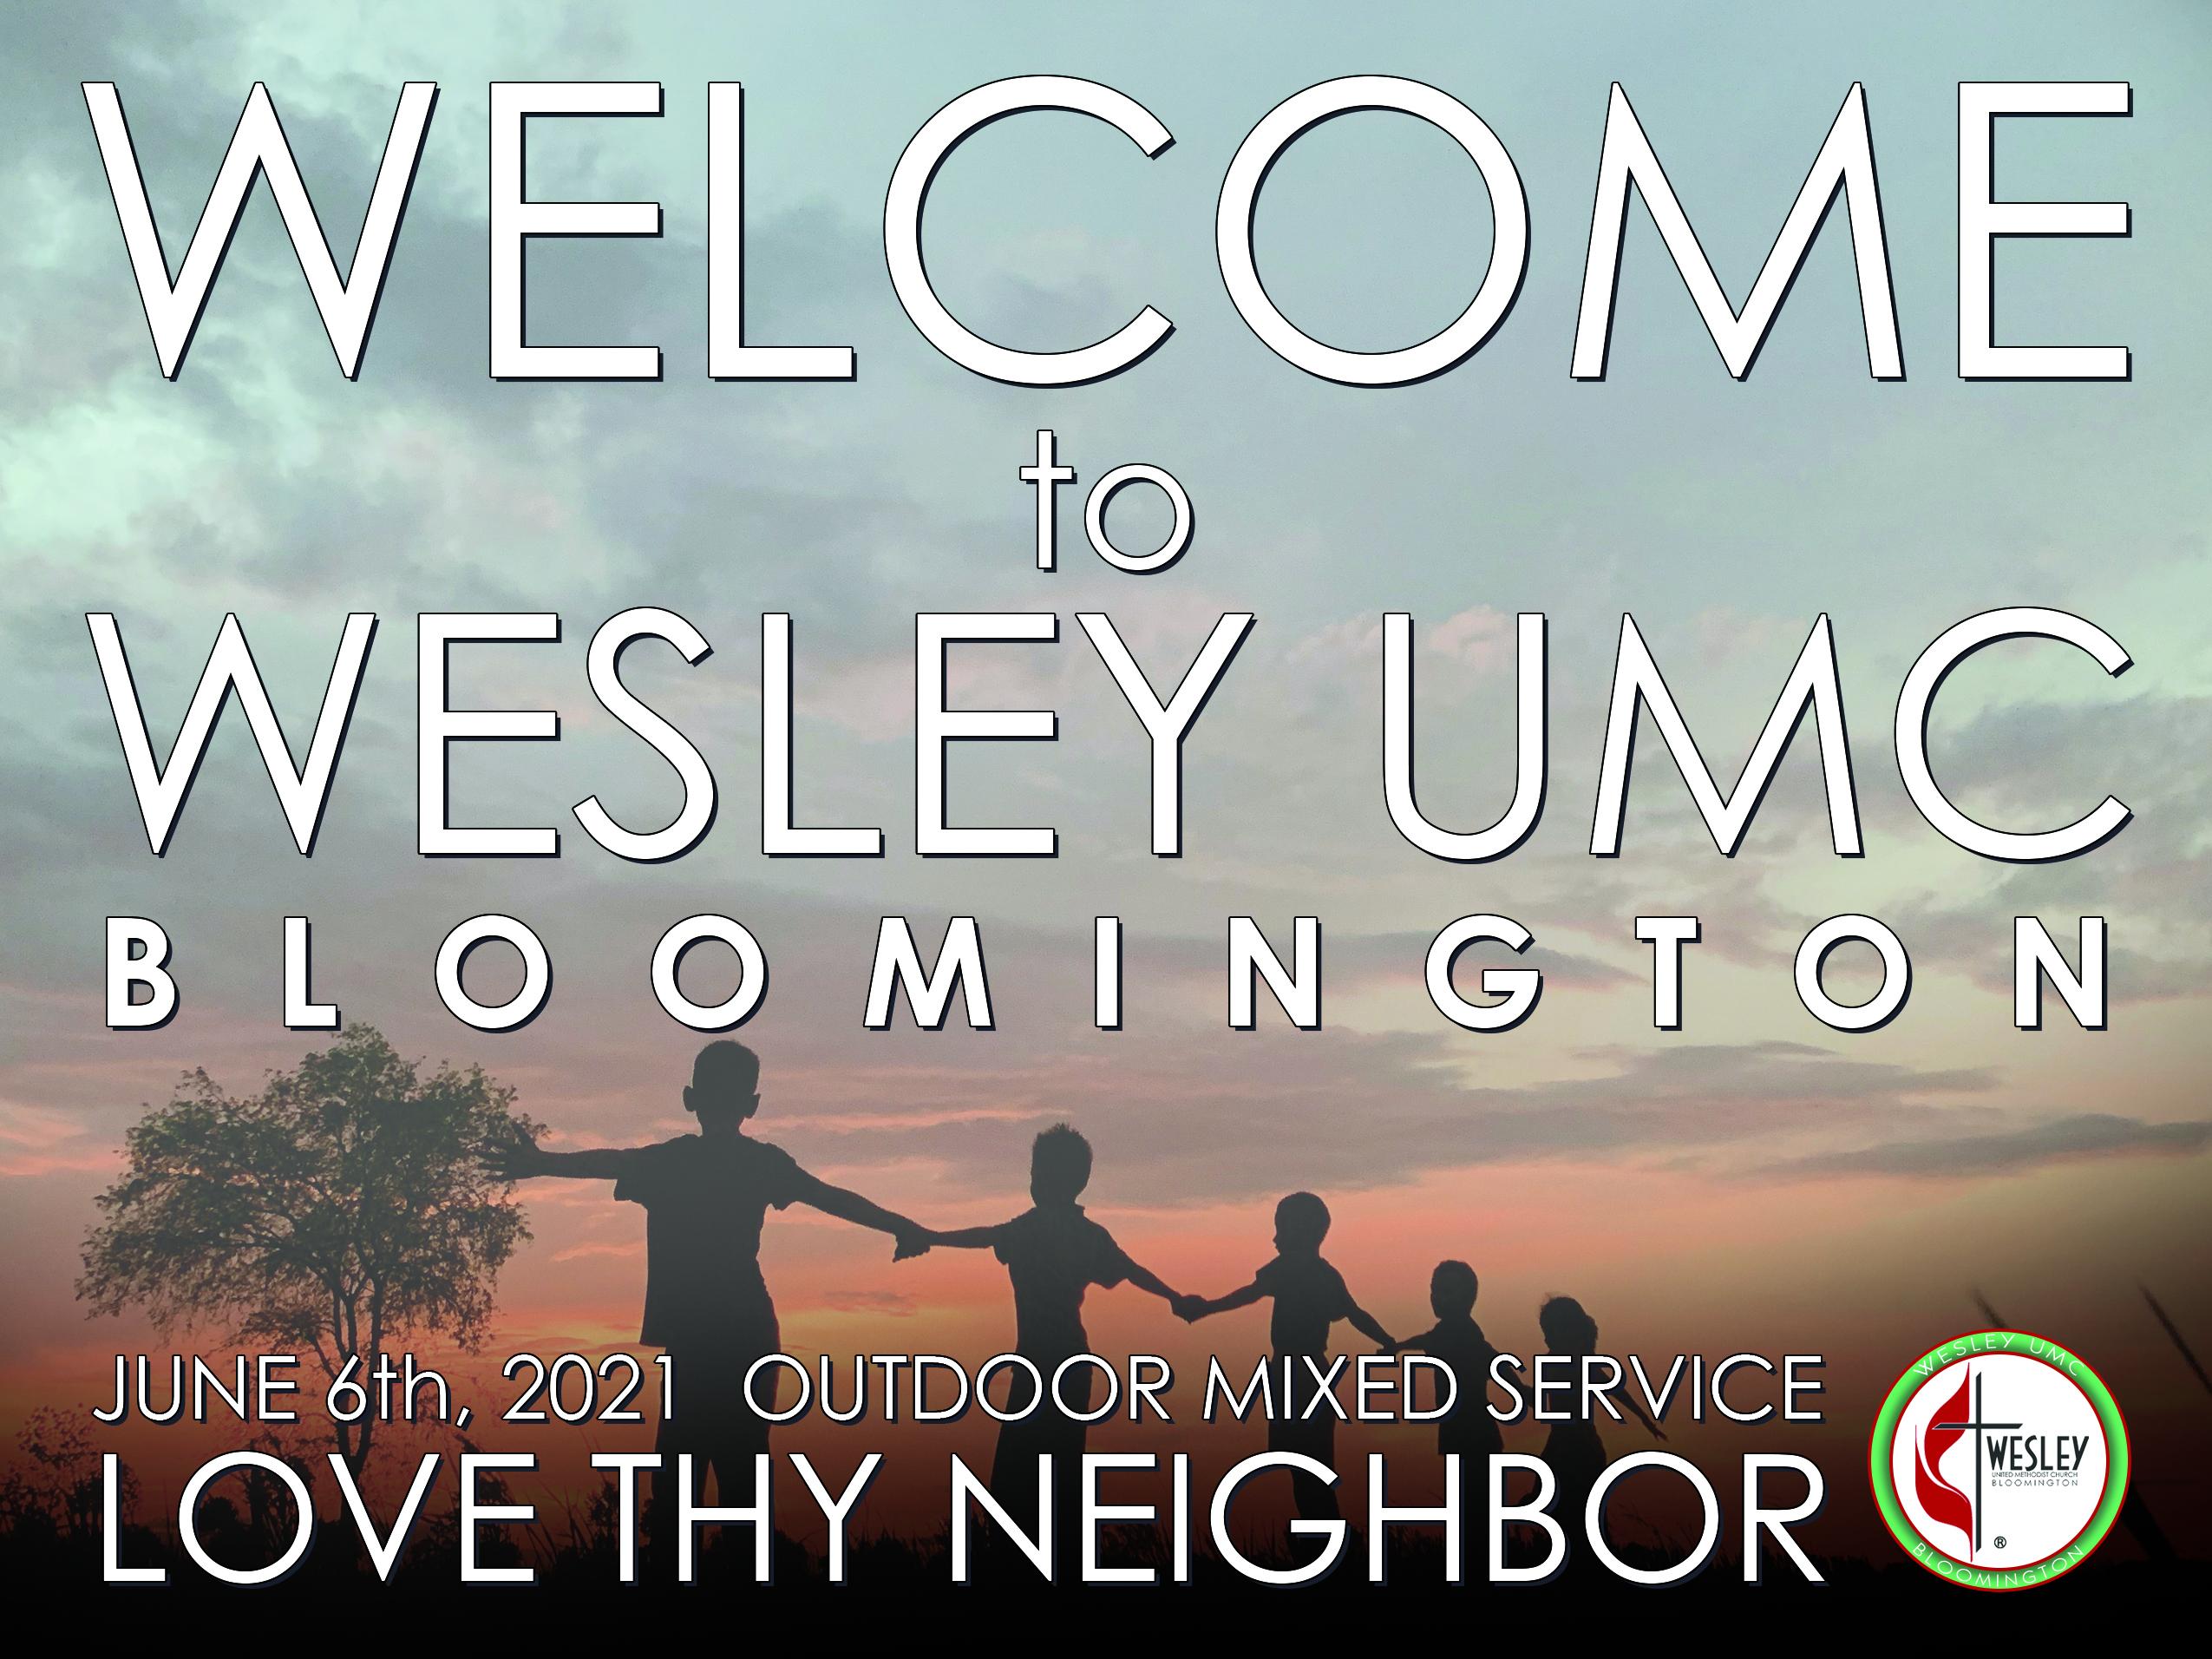 6-6-21 love thy neighbor WELCOME